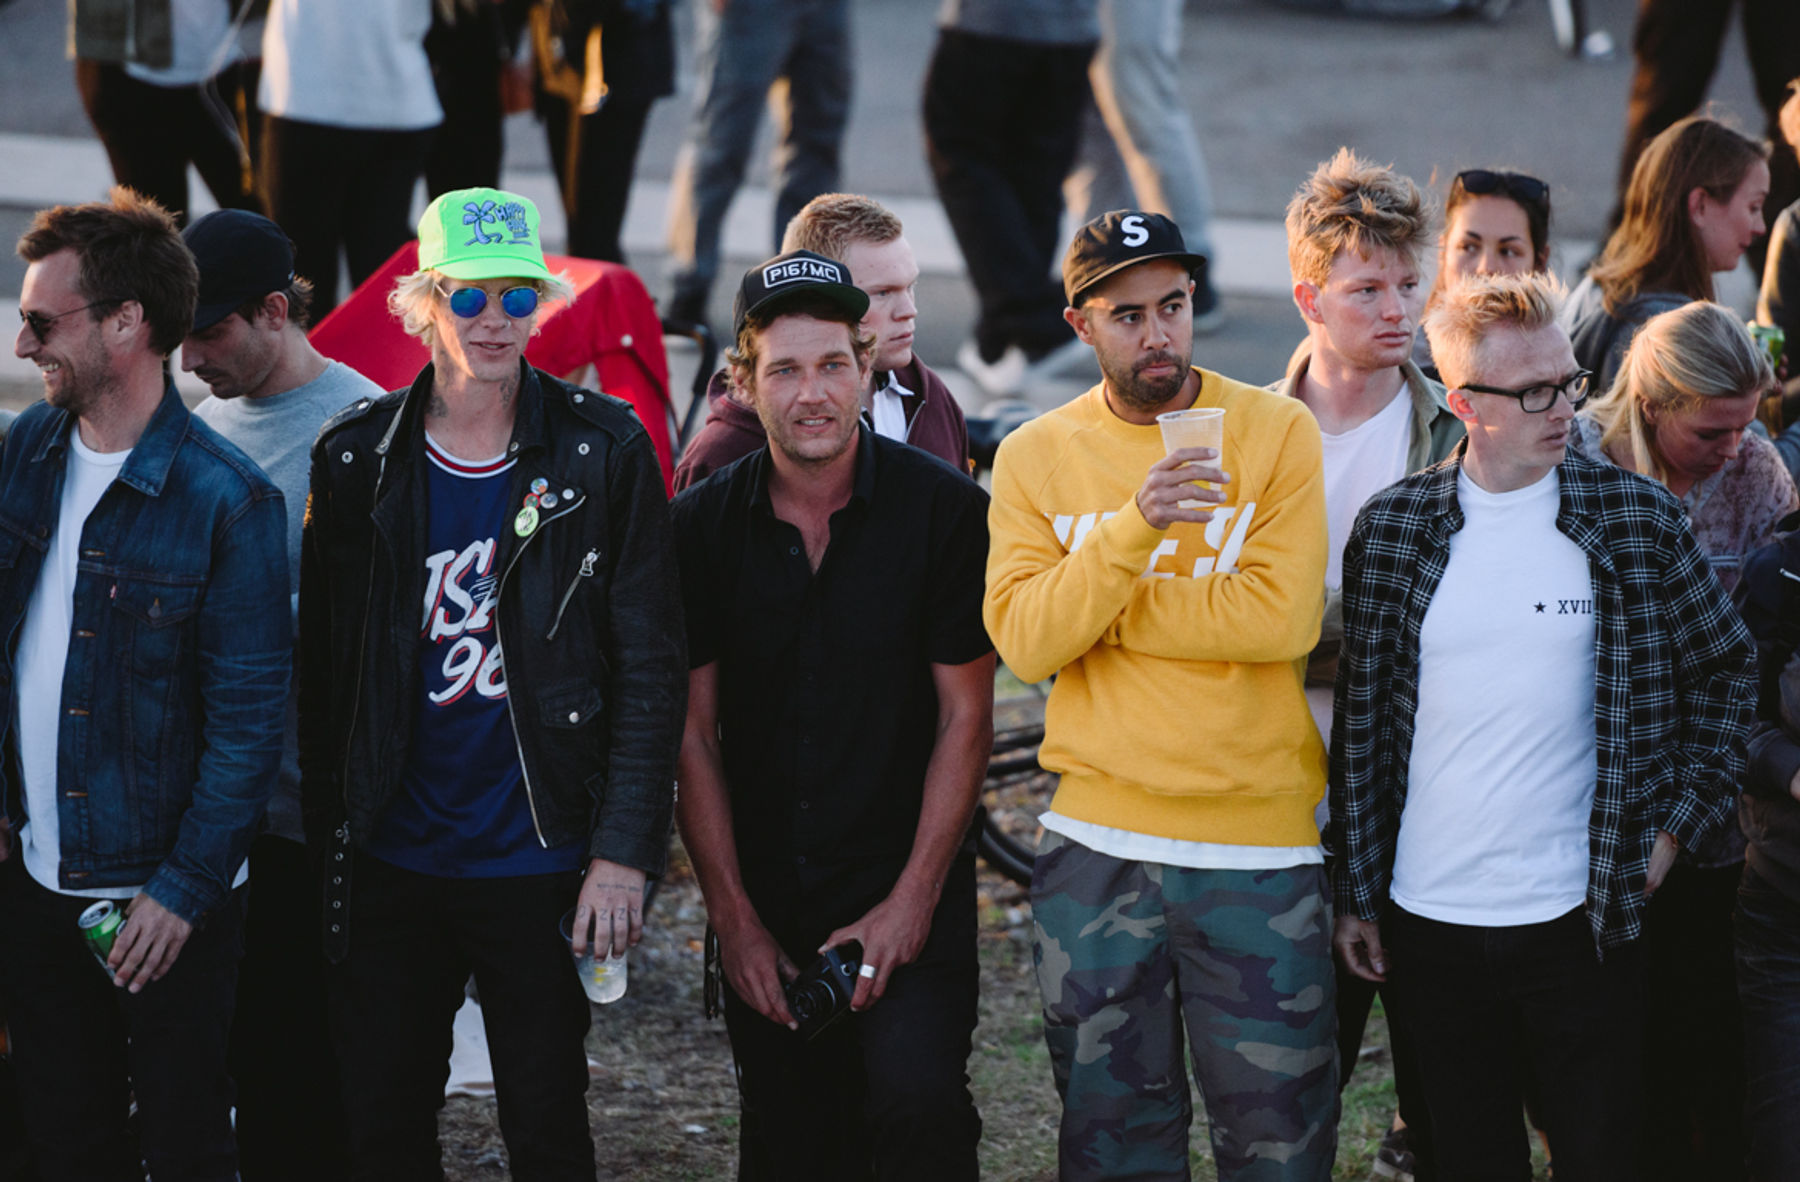 _IHC6168e-Braydon-Szafranski-Arto-Saari-Eric-Koston-Nike-SB-Copenhagen-Open-Day-4-July-2015-Photographer-Maksim-Kalanep